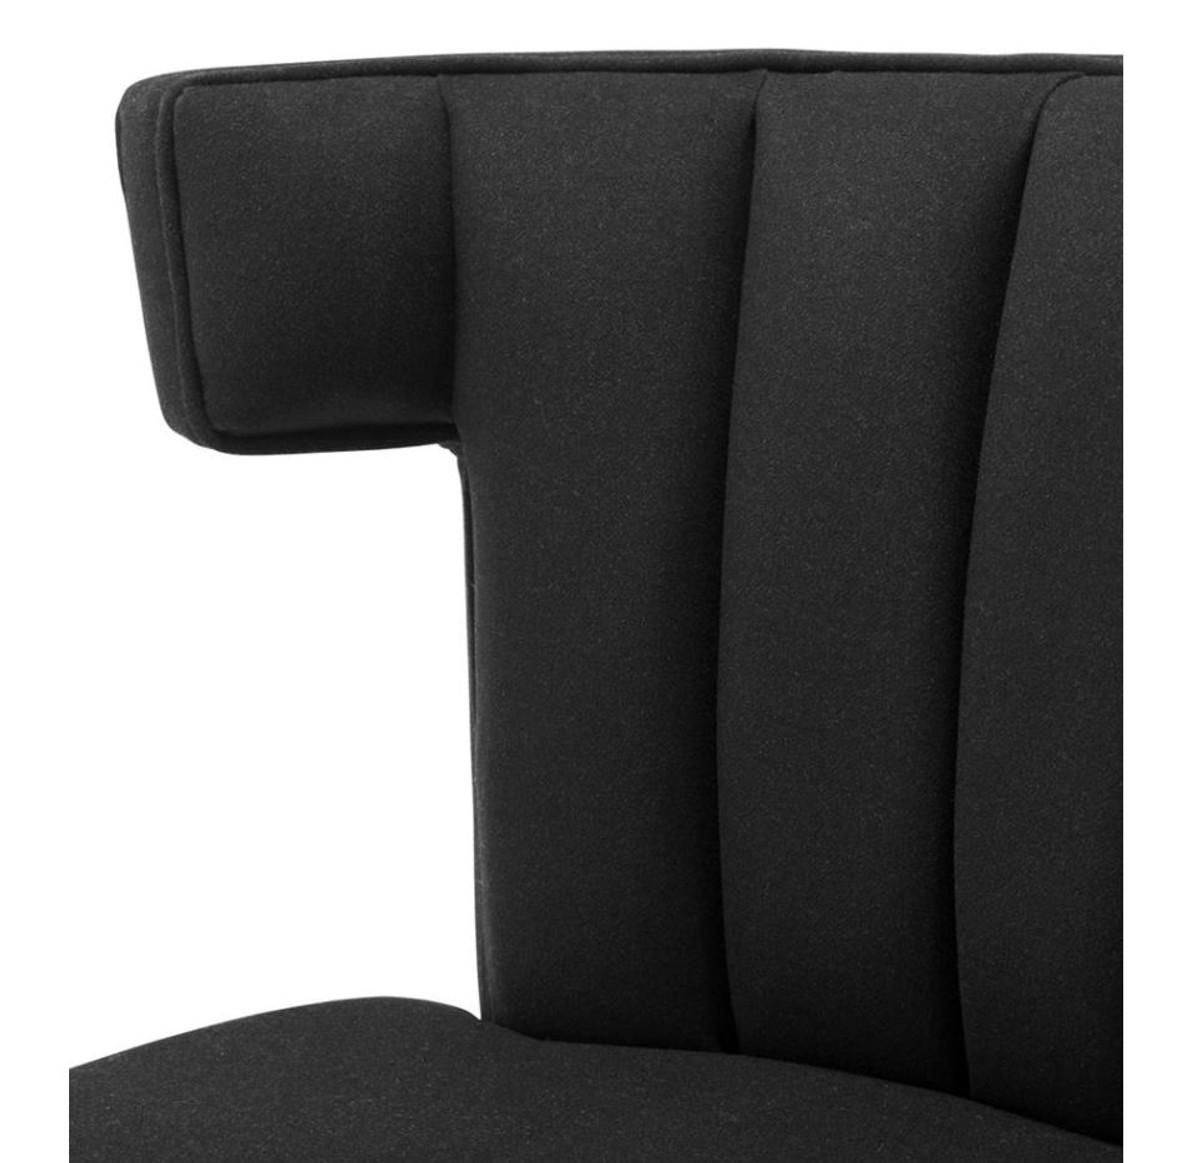 Casa Padrino Luxus Sessel Schwarz Designer Möbel Sessel